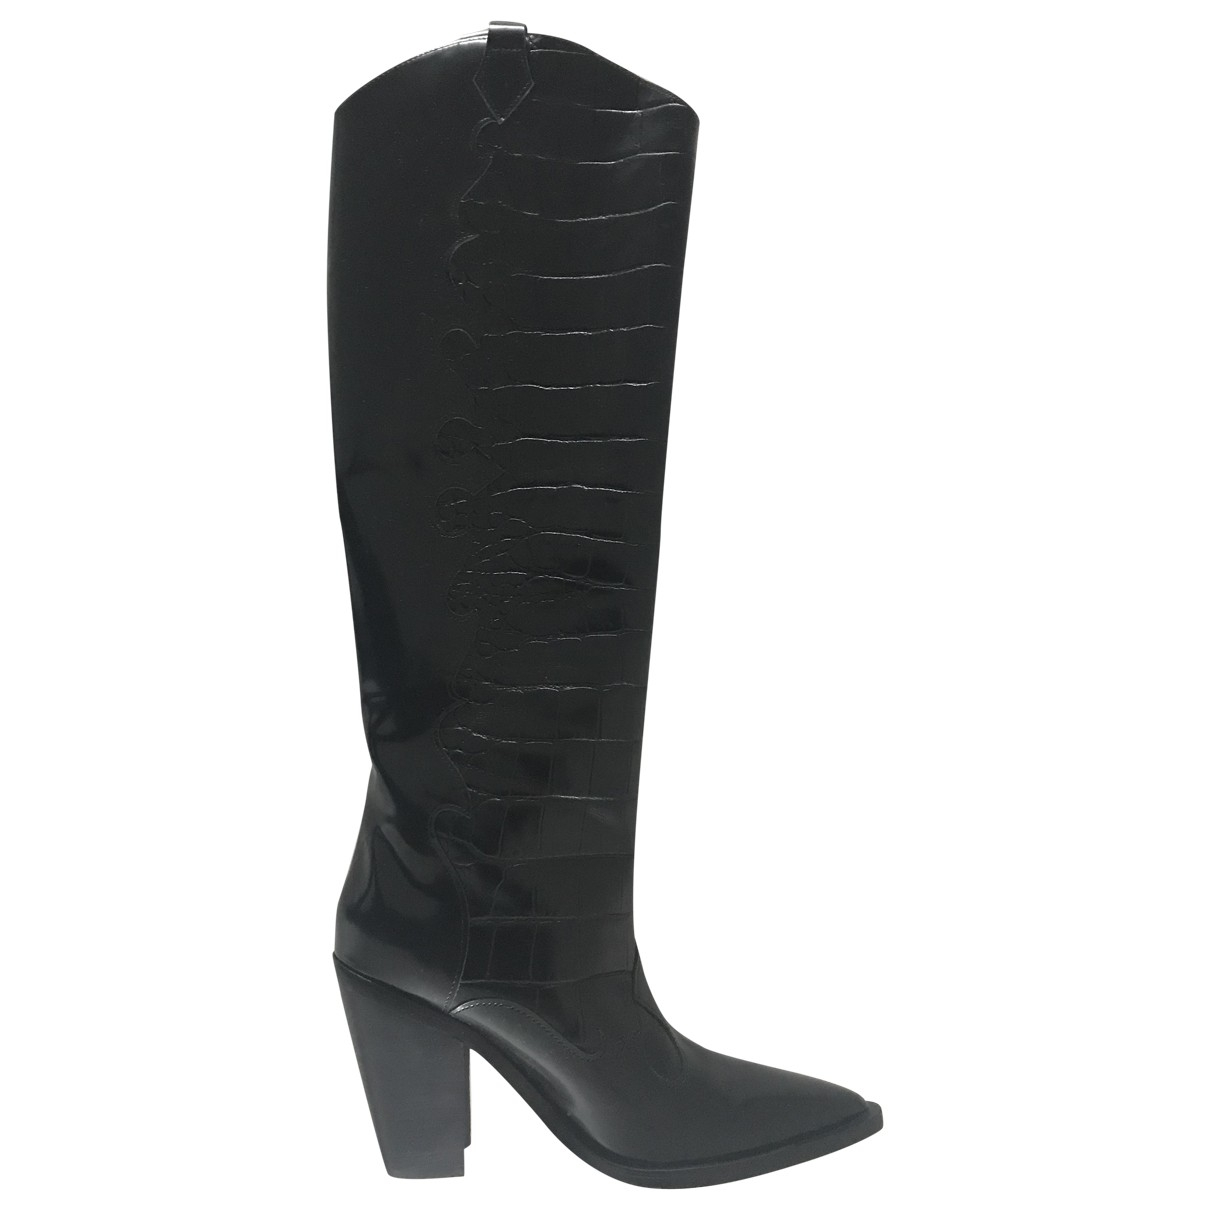 Sigerson Morrison \N Black Patent leather Boots for Women 37 EU